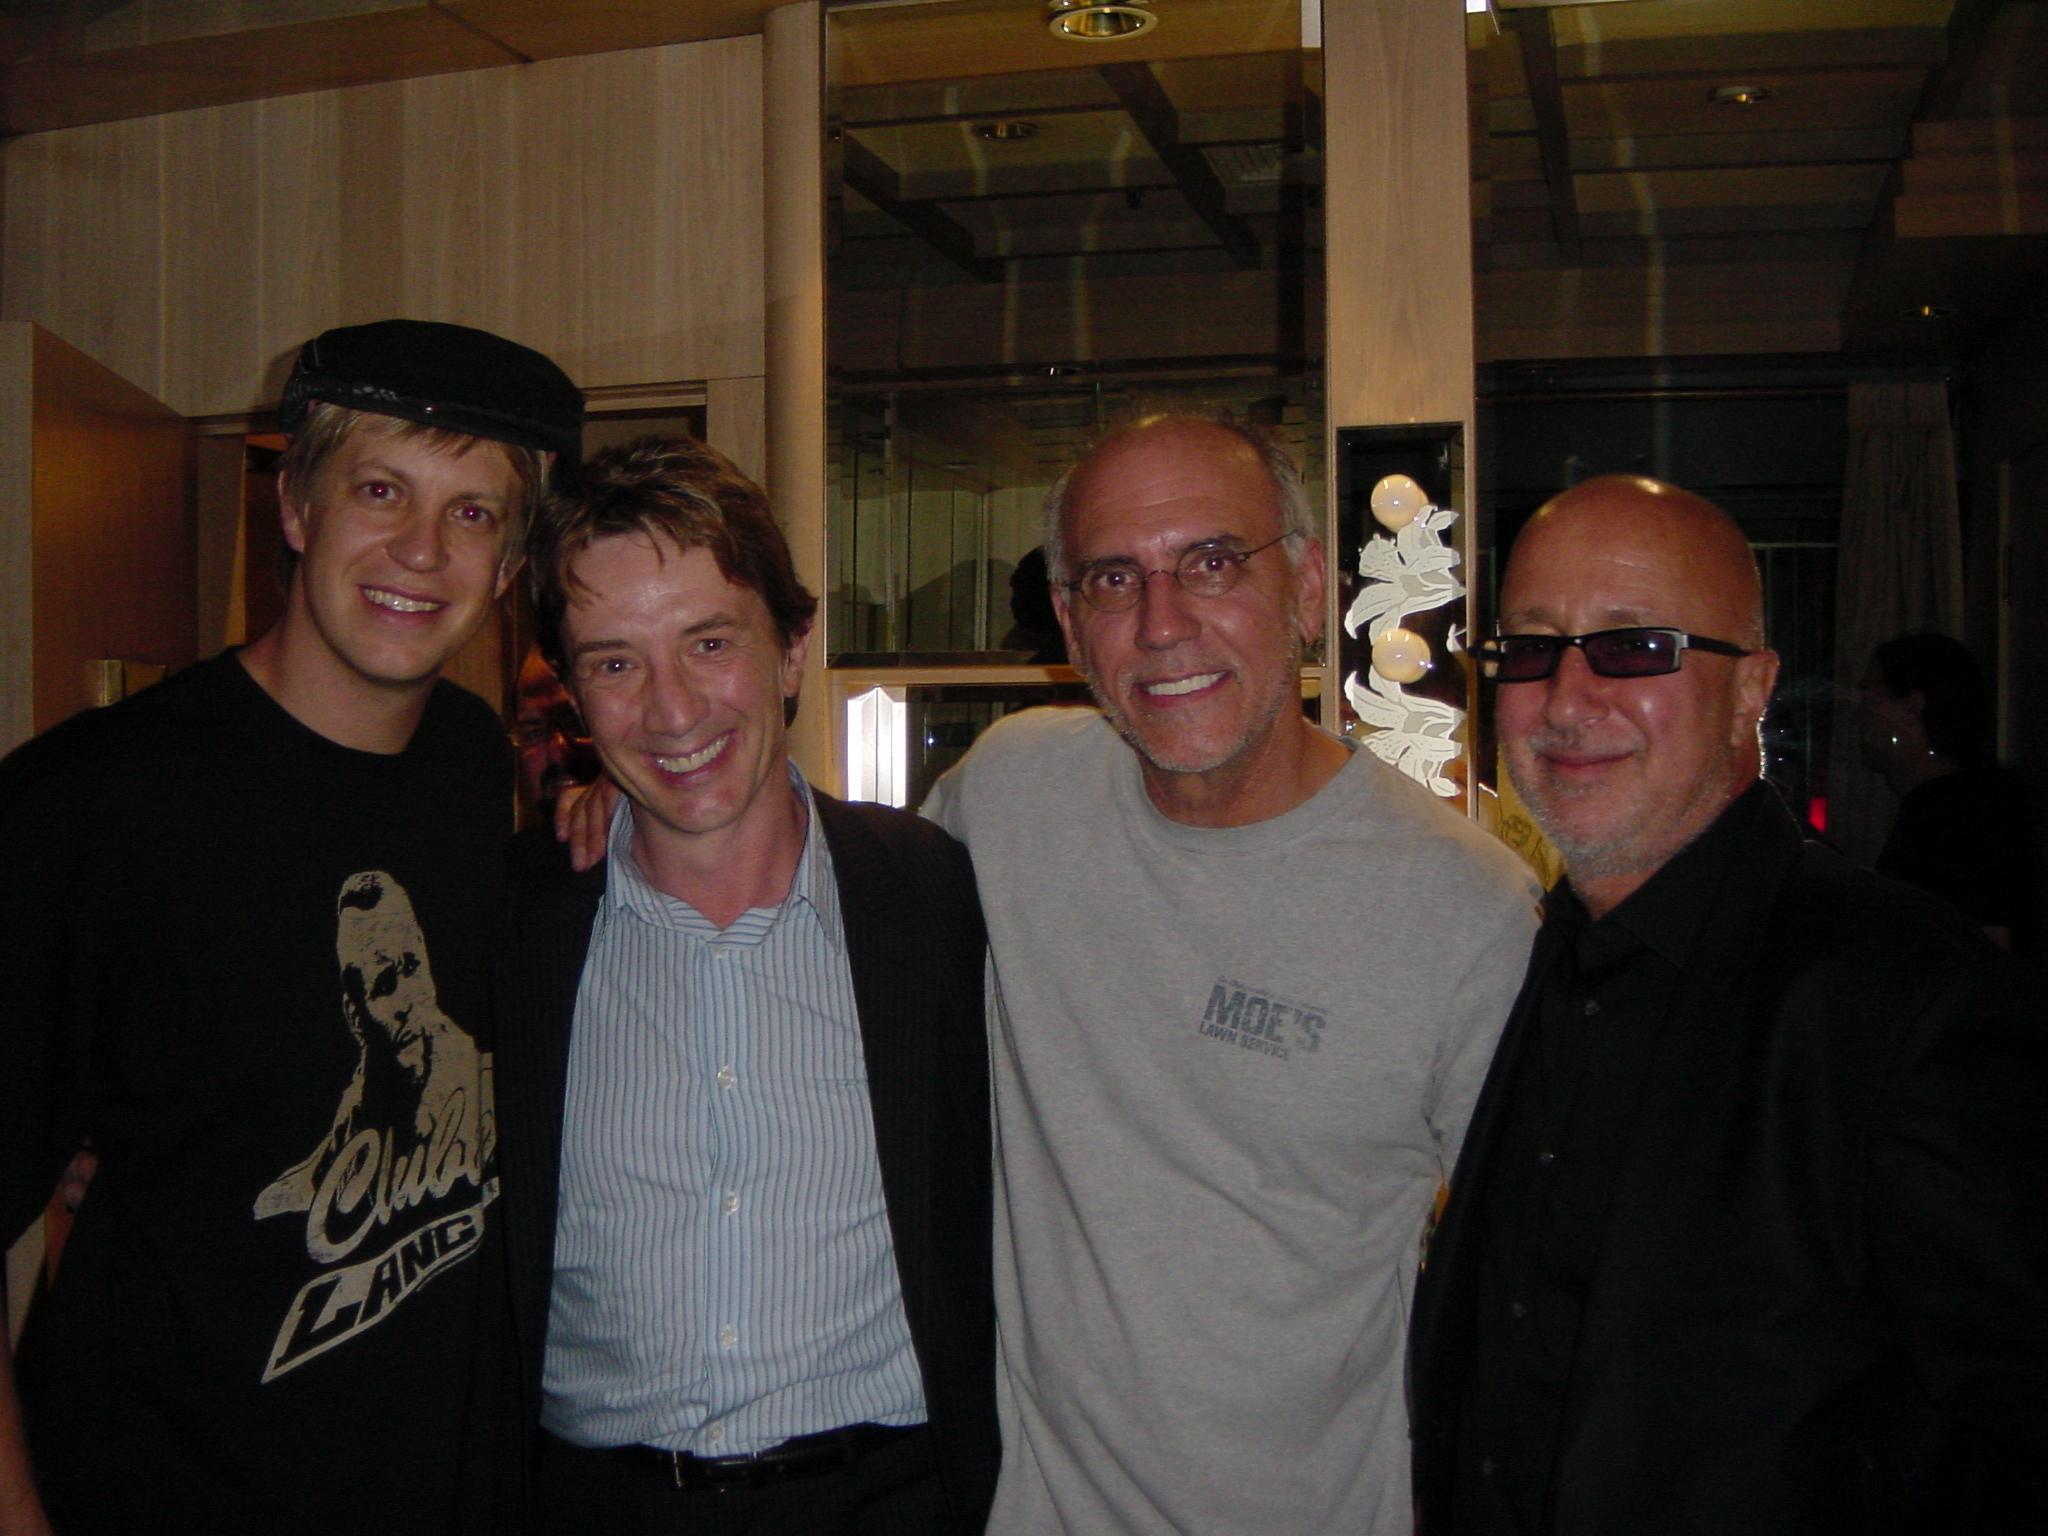 w/ Martin Short, Larry Carlton & Paul Shaffer Blue Note NYC 2005